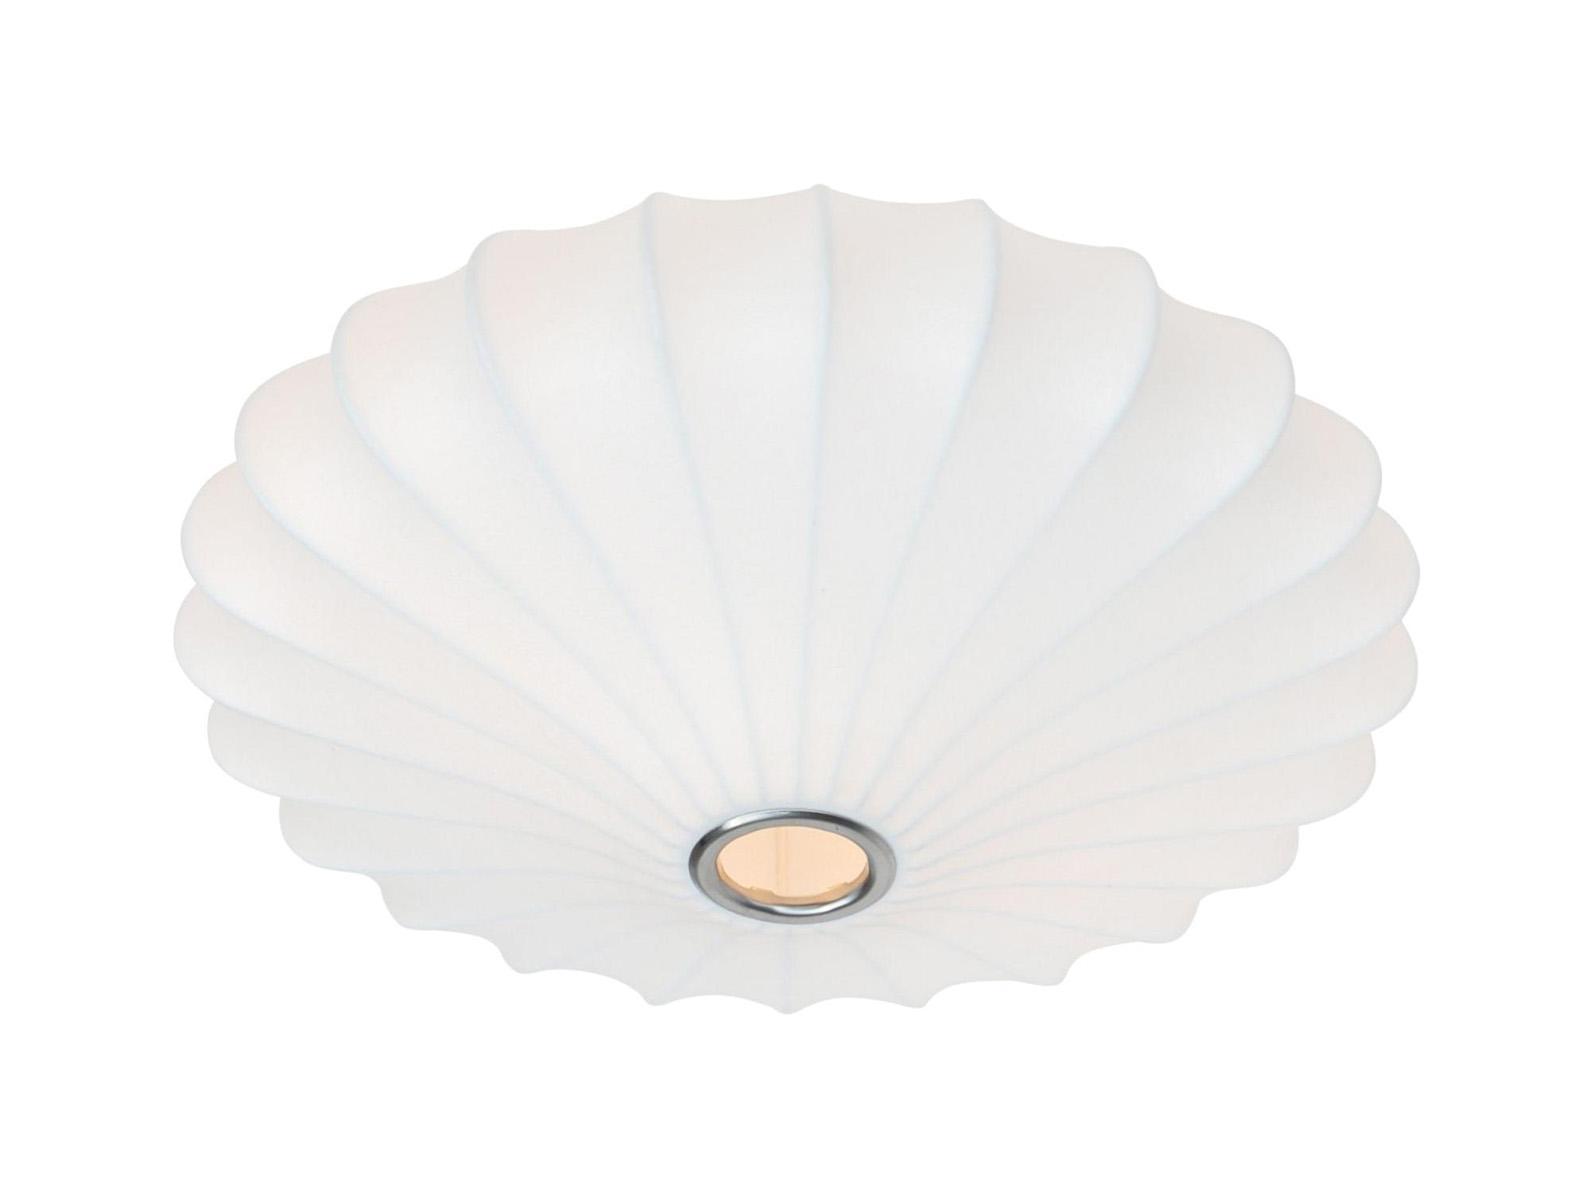 A6090PL-2WHПотолочный светильникA6090PL-2WHA6090PL-2WHПотолочный светильник 2xE27 40WМатериал: Арматура: Металл крашенный / Плафон: ТканьЦвет: Арматура: Белый / Плафон: БелыйРазмер: 17x42x42